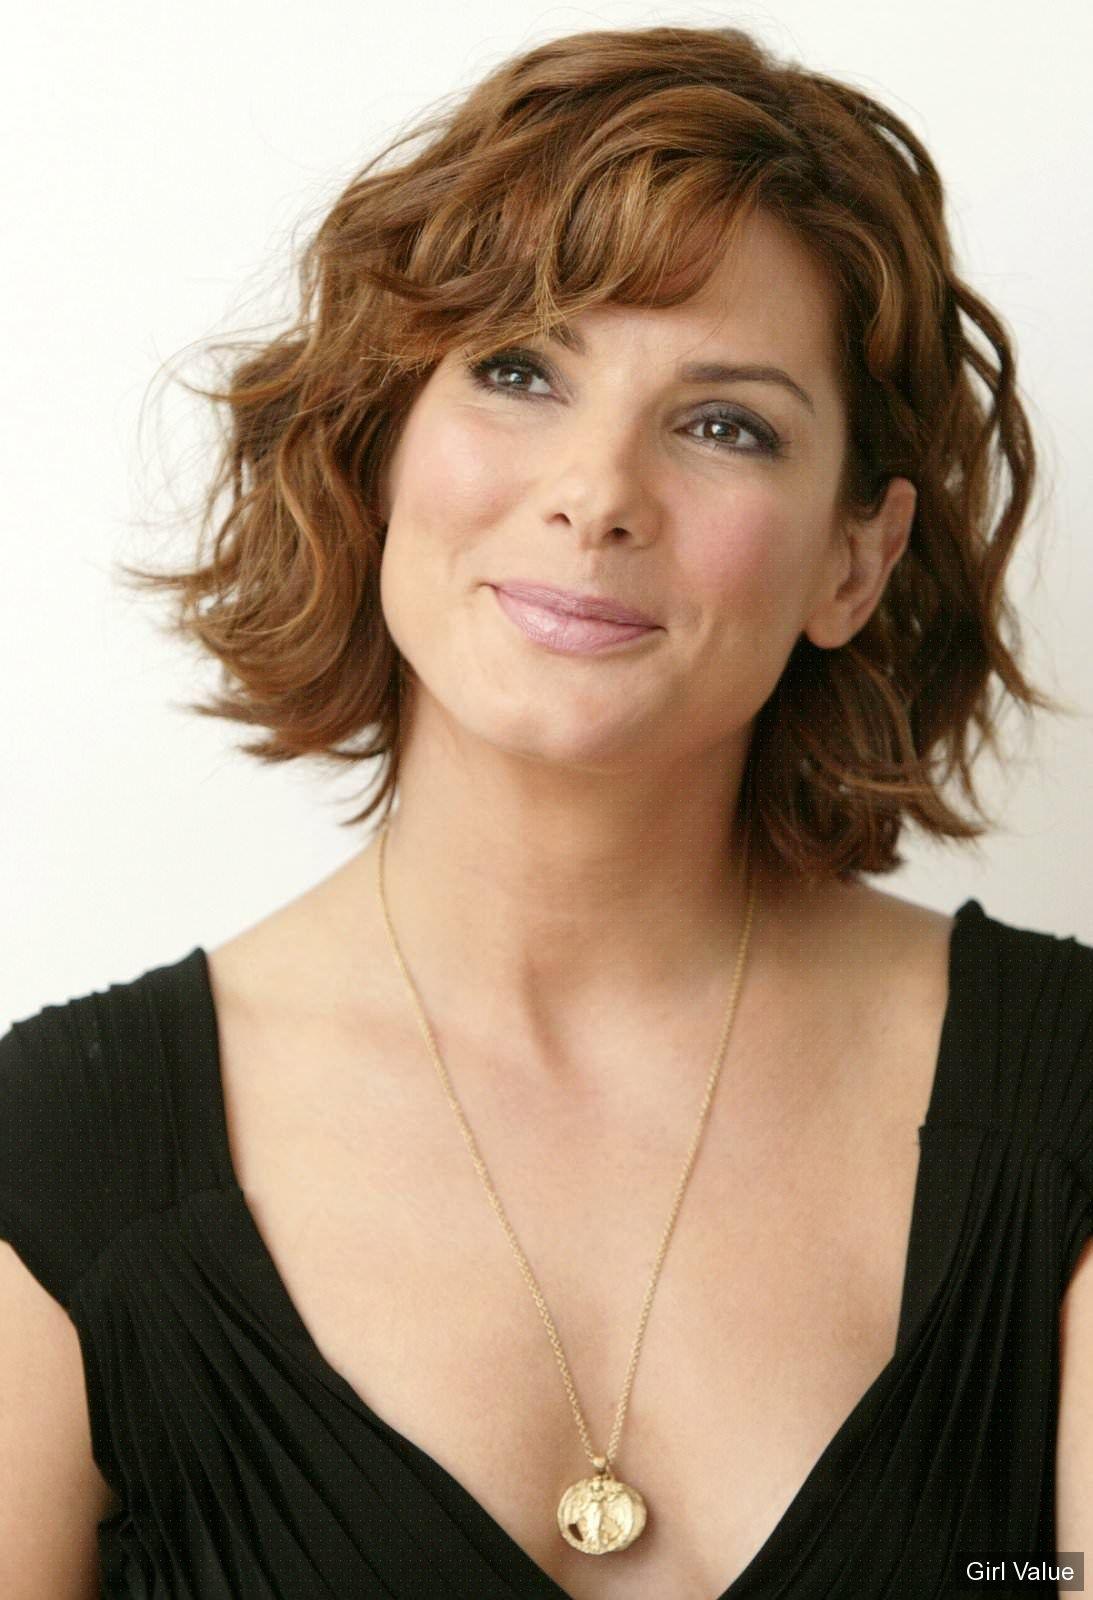 Female Celebrities With Light Brown Hair pertaining to sandra bullock light brown curly hair in black dress   sandra